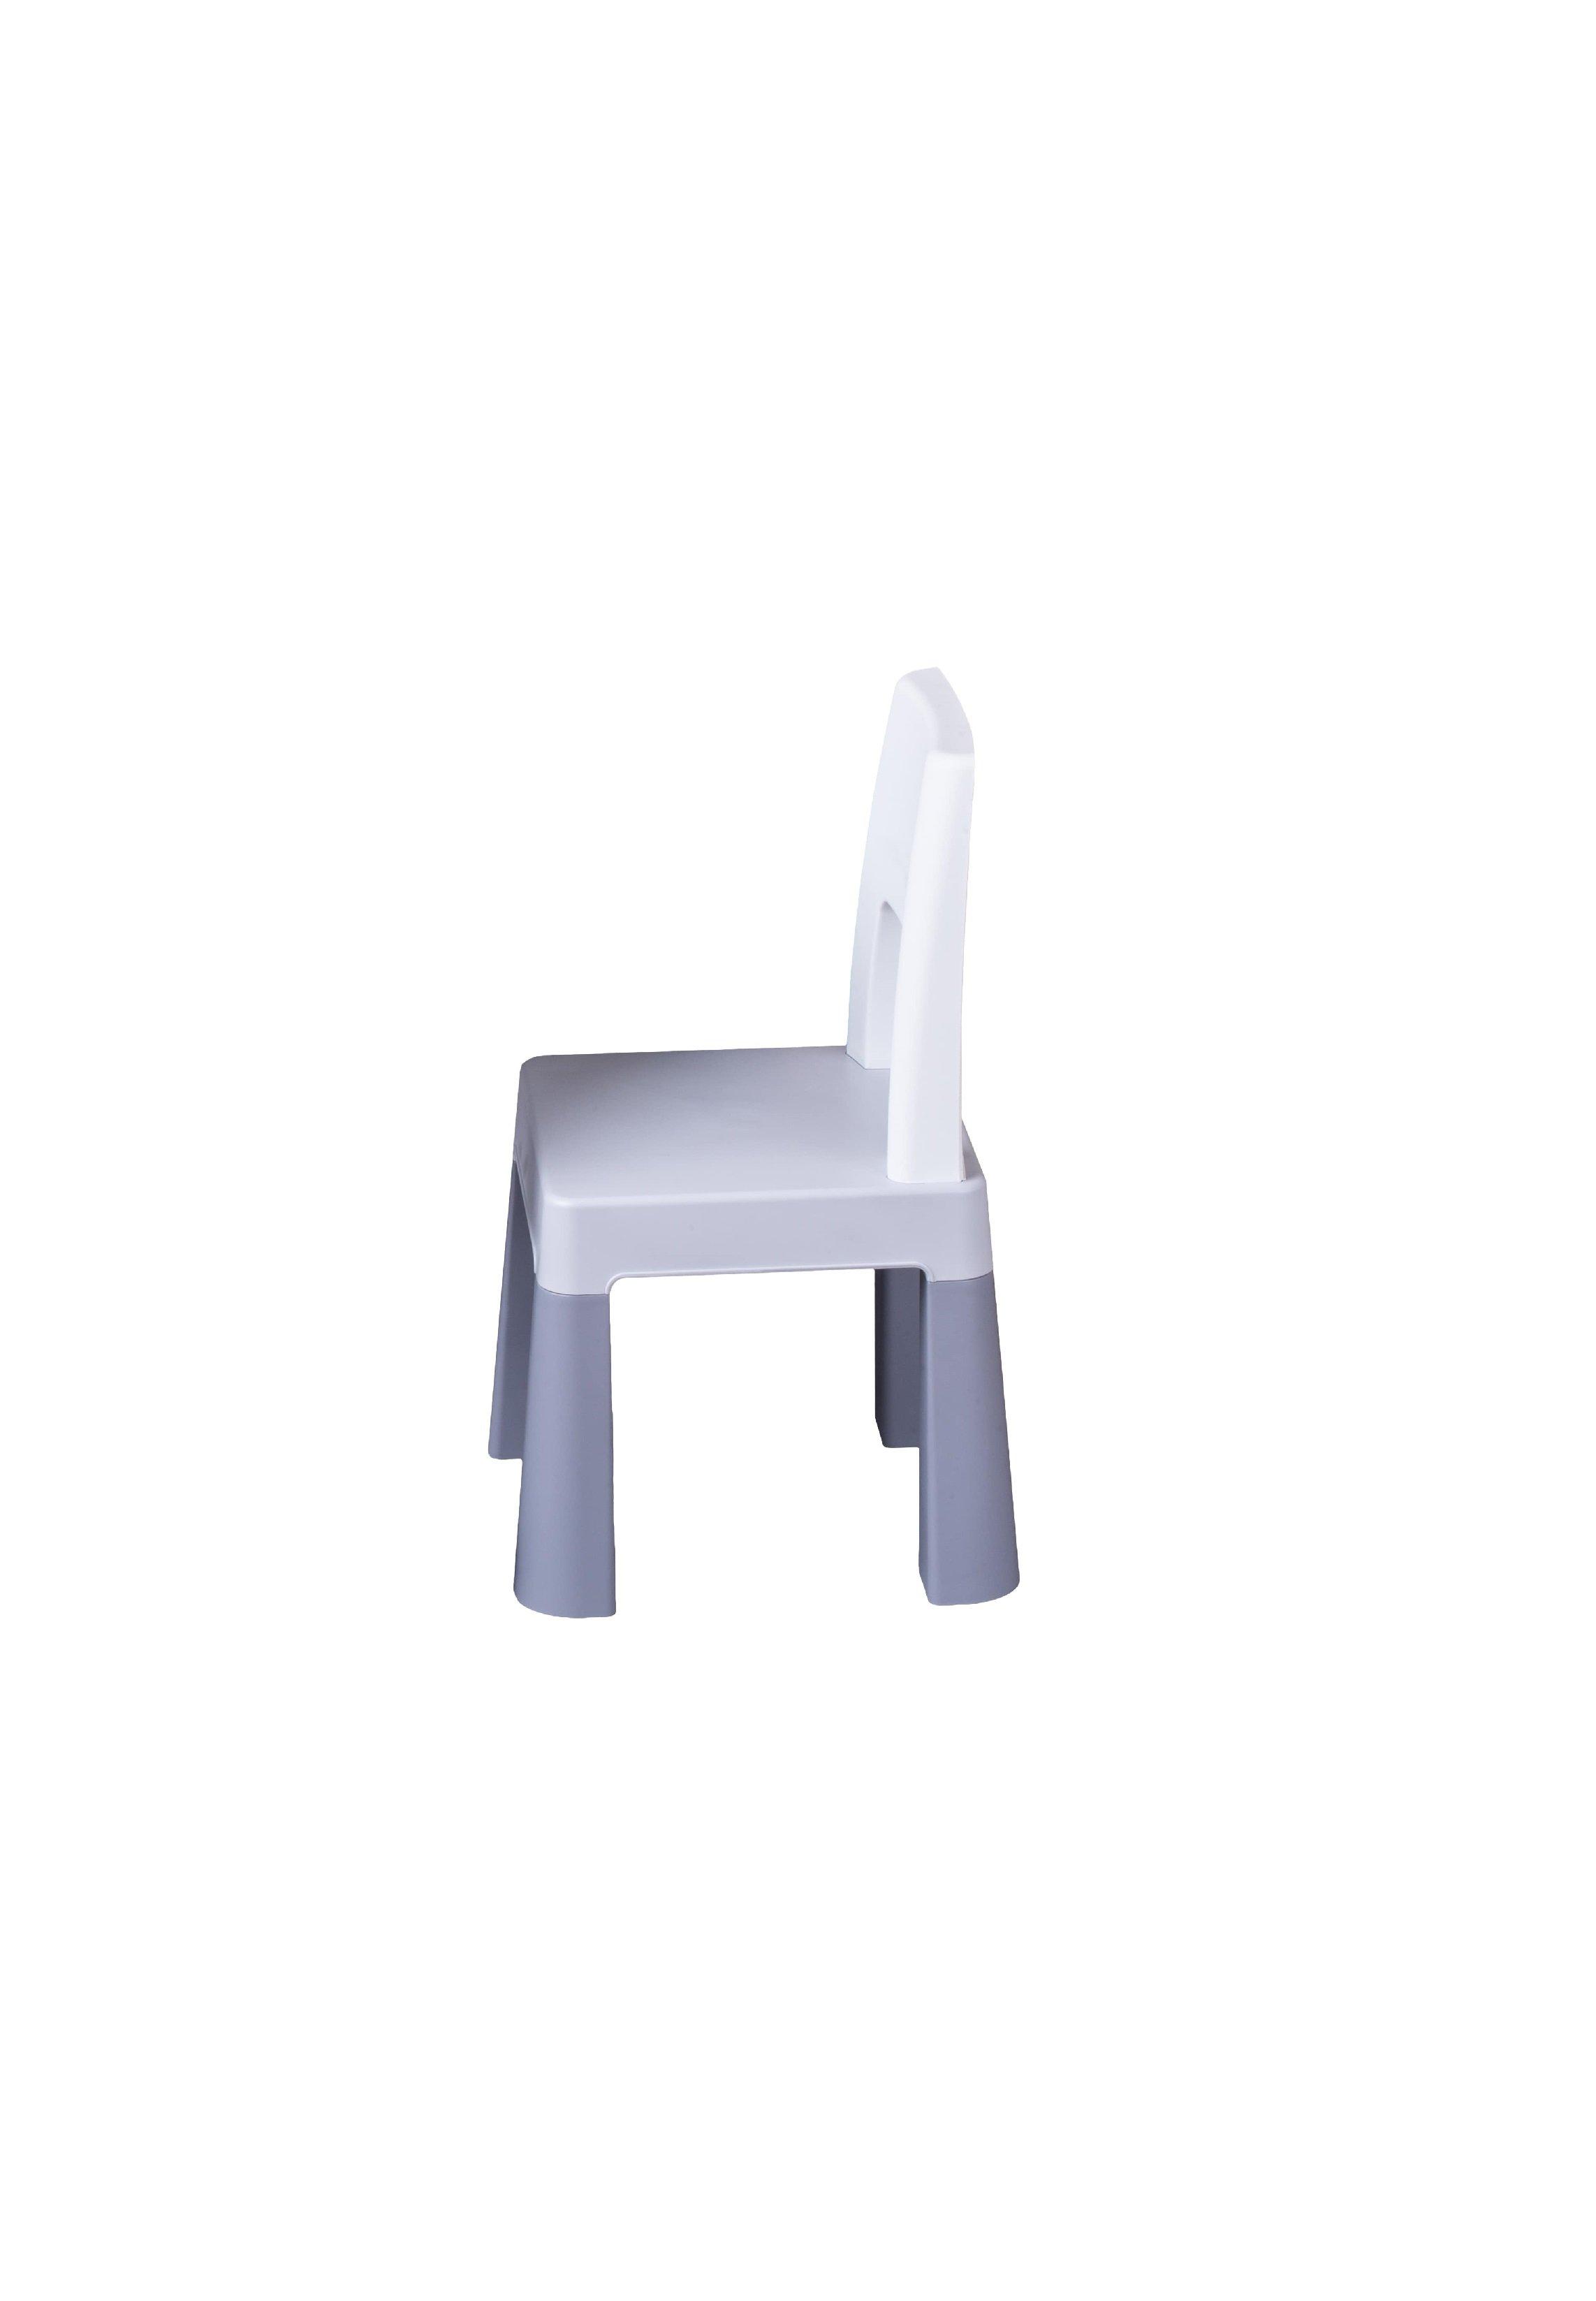 Židlièka ke stoleèku multifun šedá